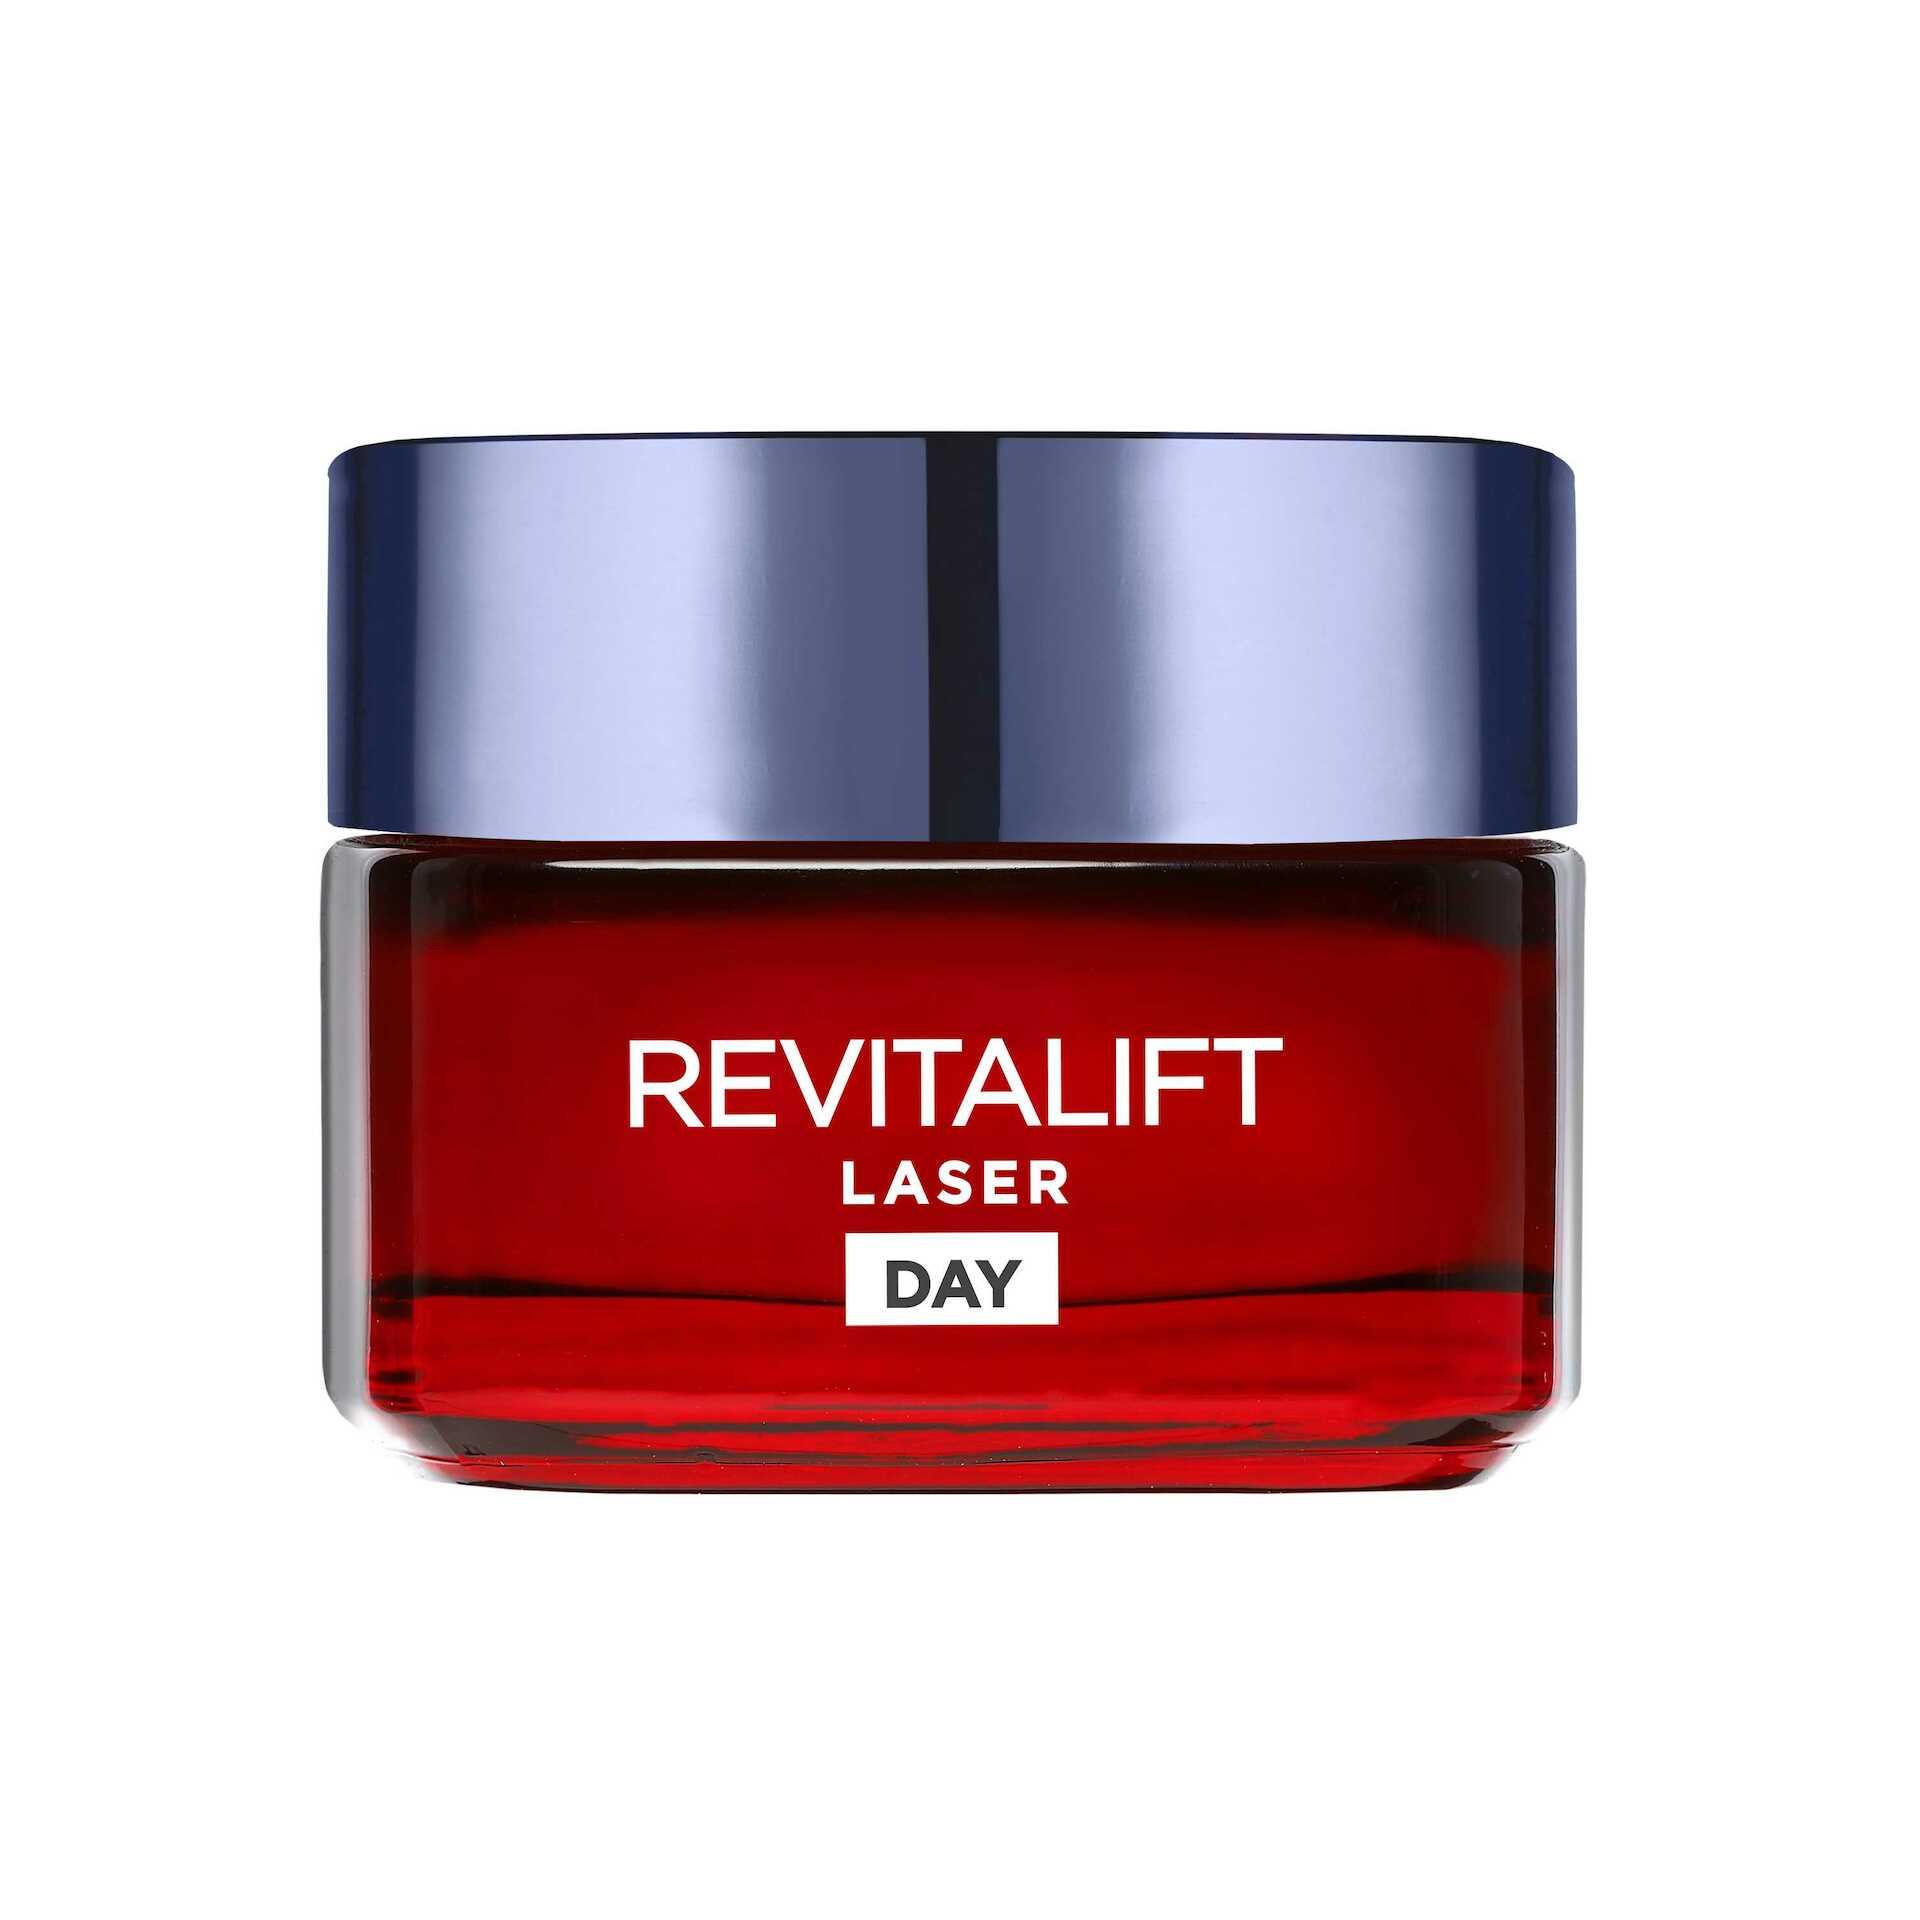 Revitalfit Laser Day Cream